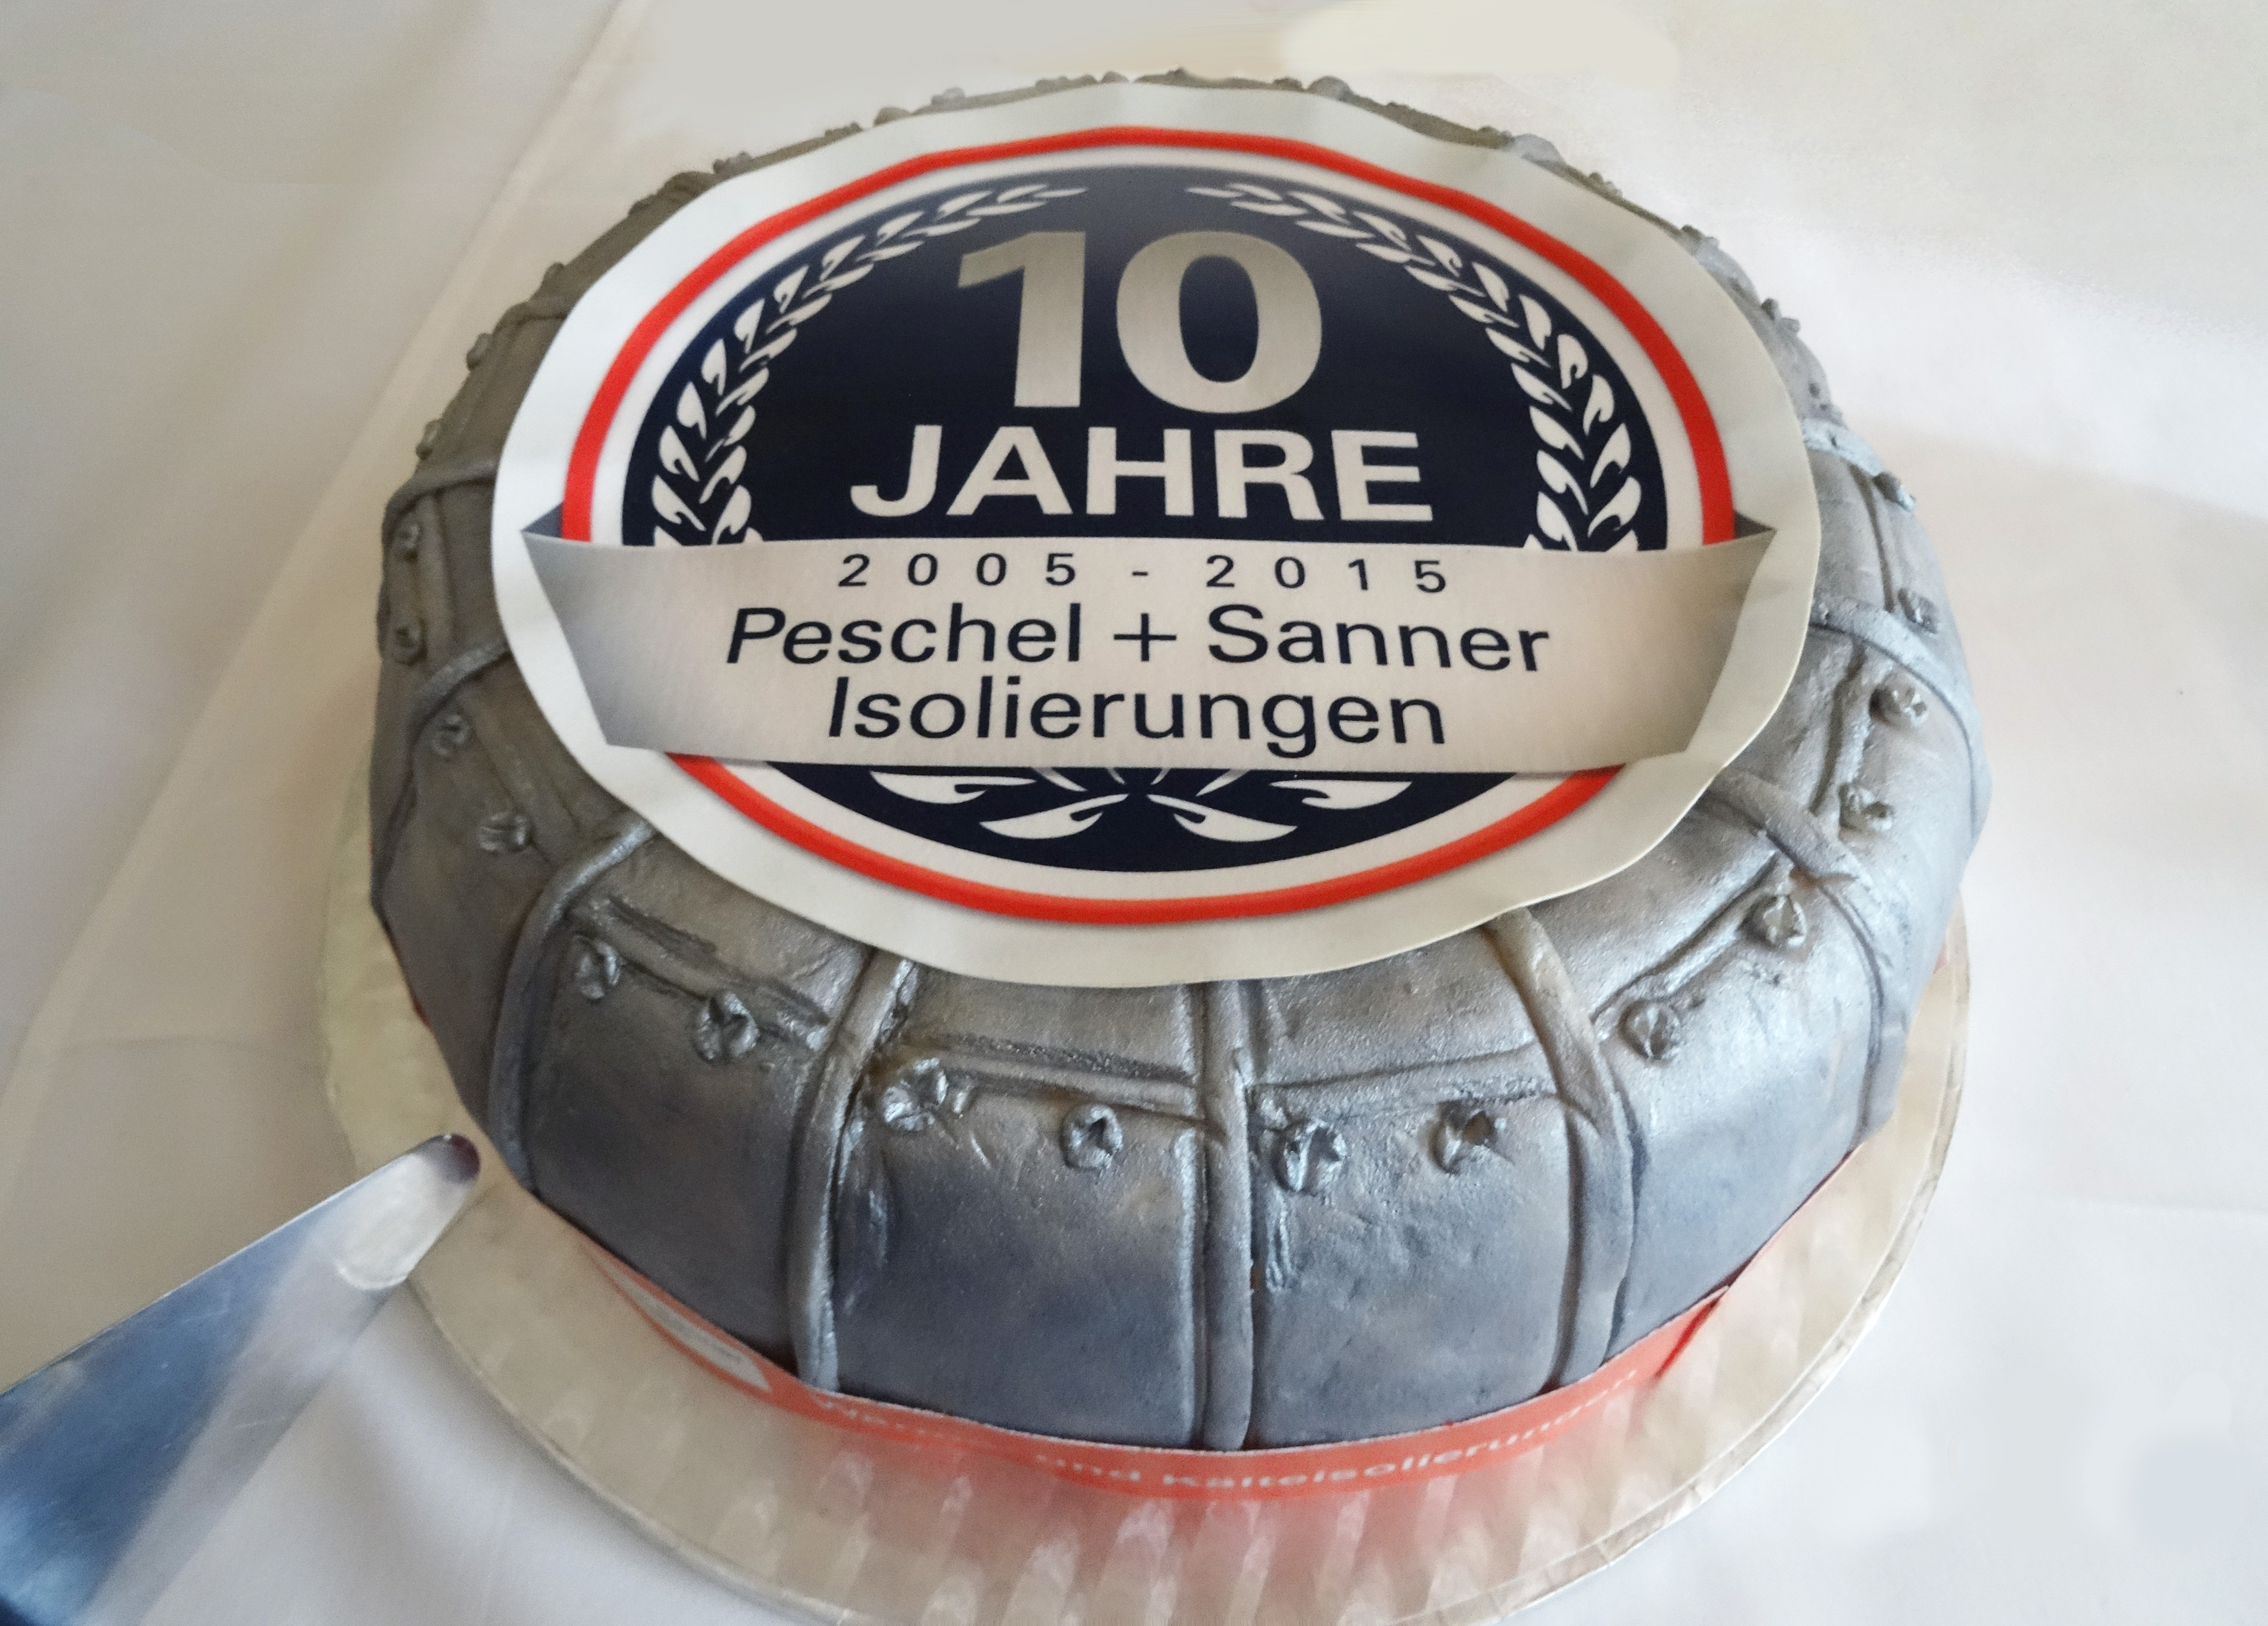 Peschel-Sanner-torte-jubilaeum